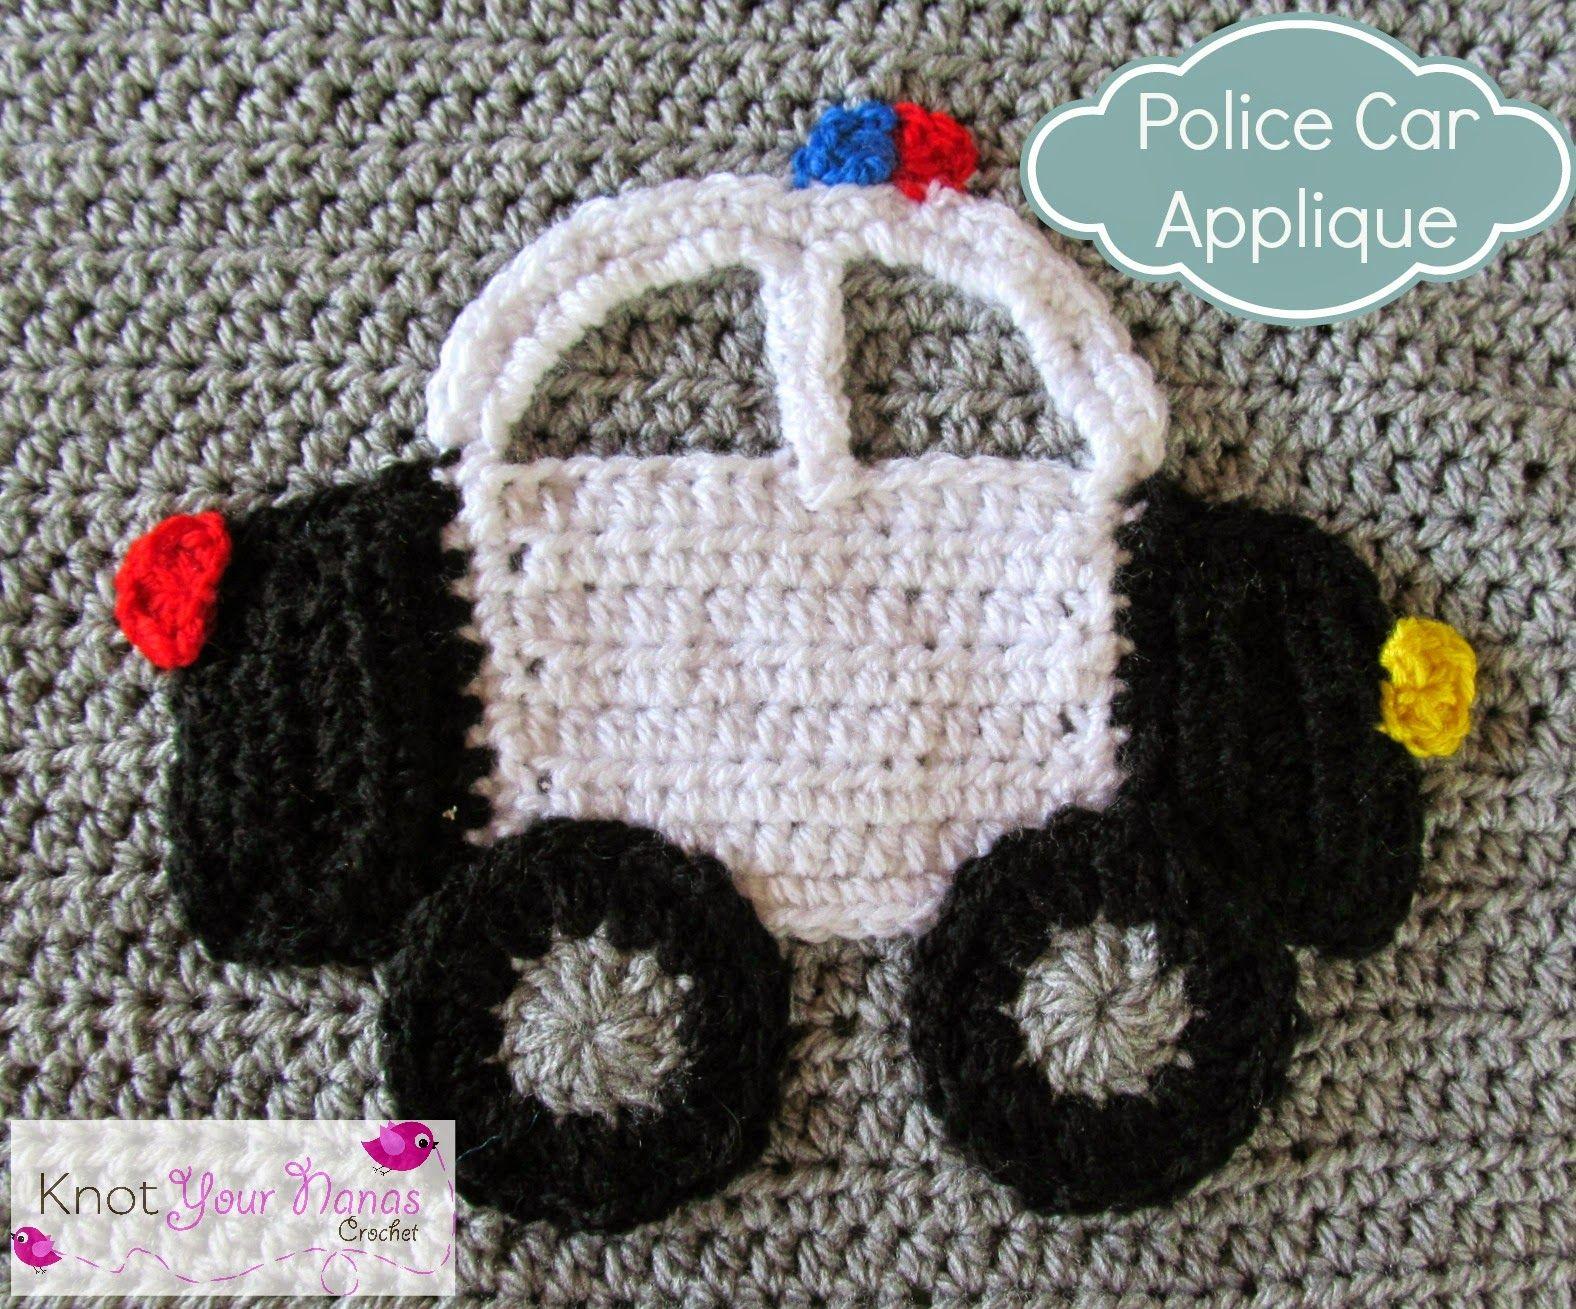 Boys Will Be Boys Blanket Police Car Applique